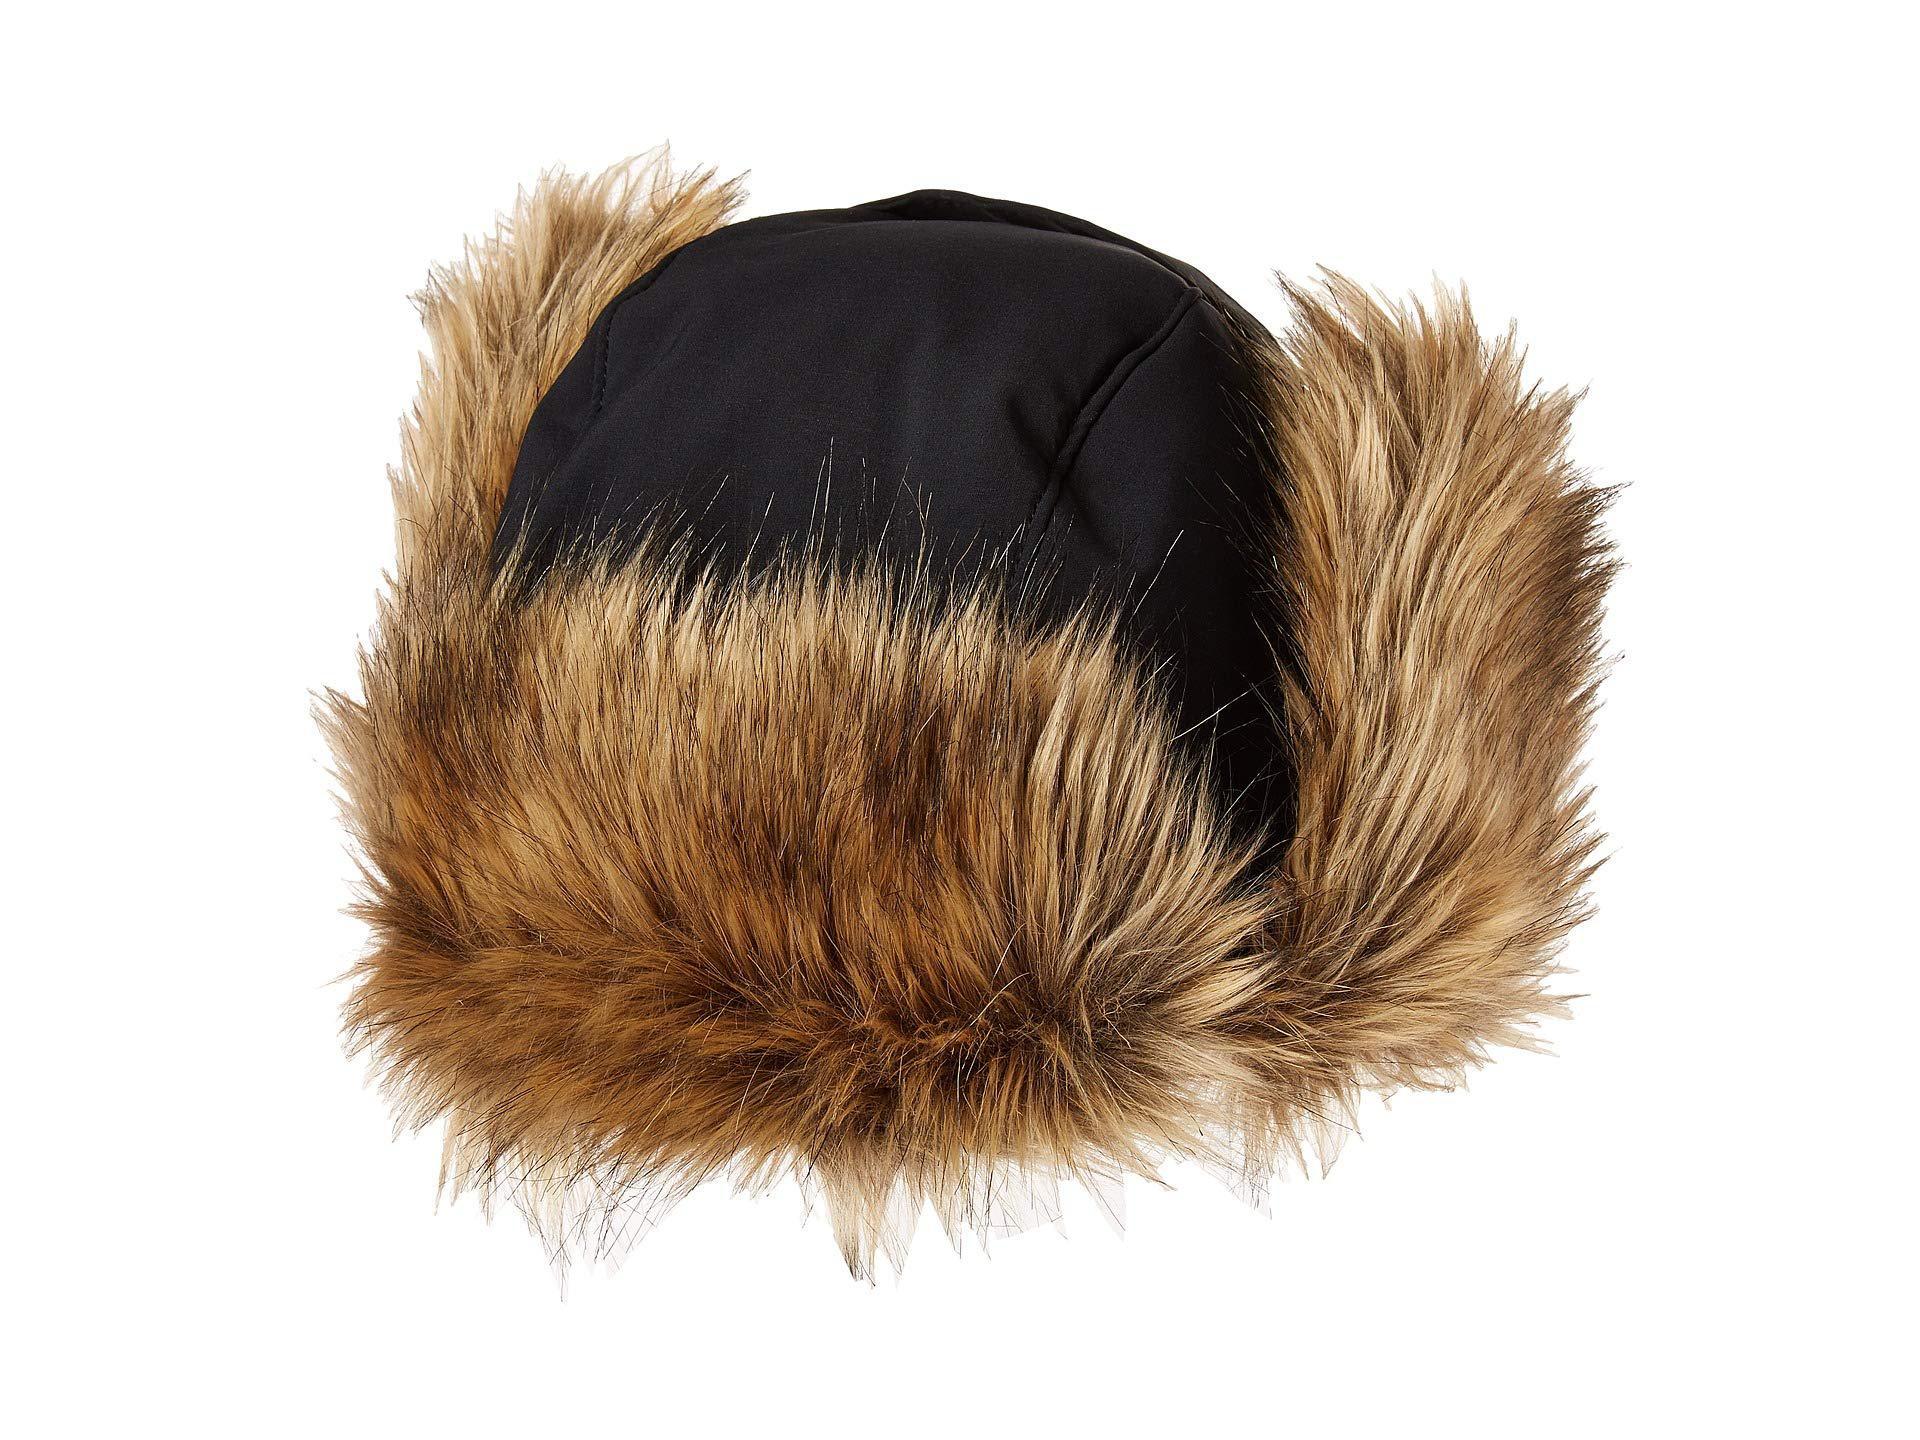 84c8fe0d7dde2 Lyst - Columbia Winter Challengertm Trapper (black brown) Caps for Men